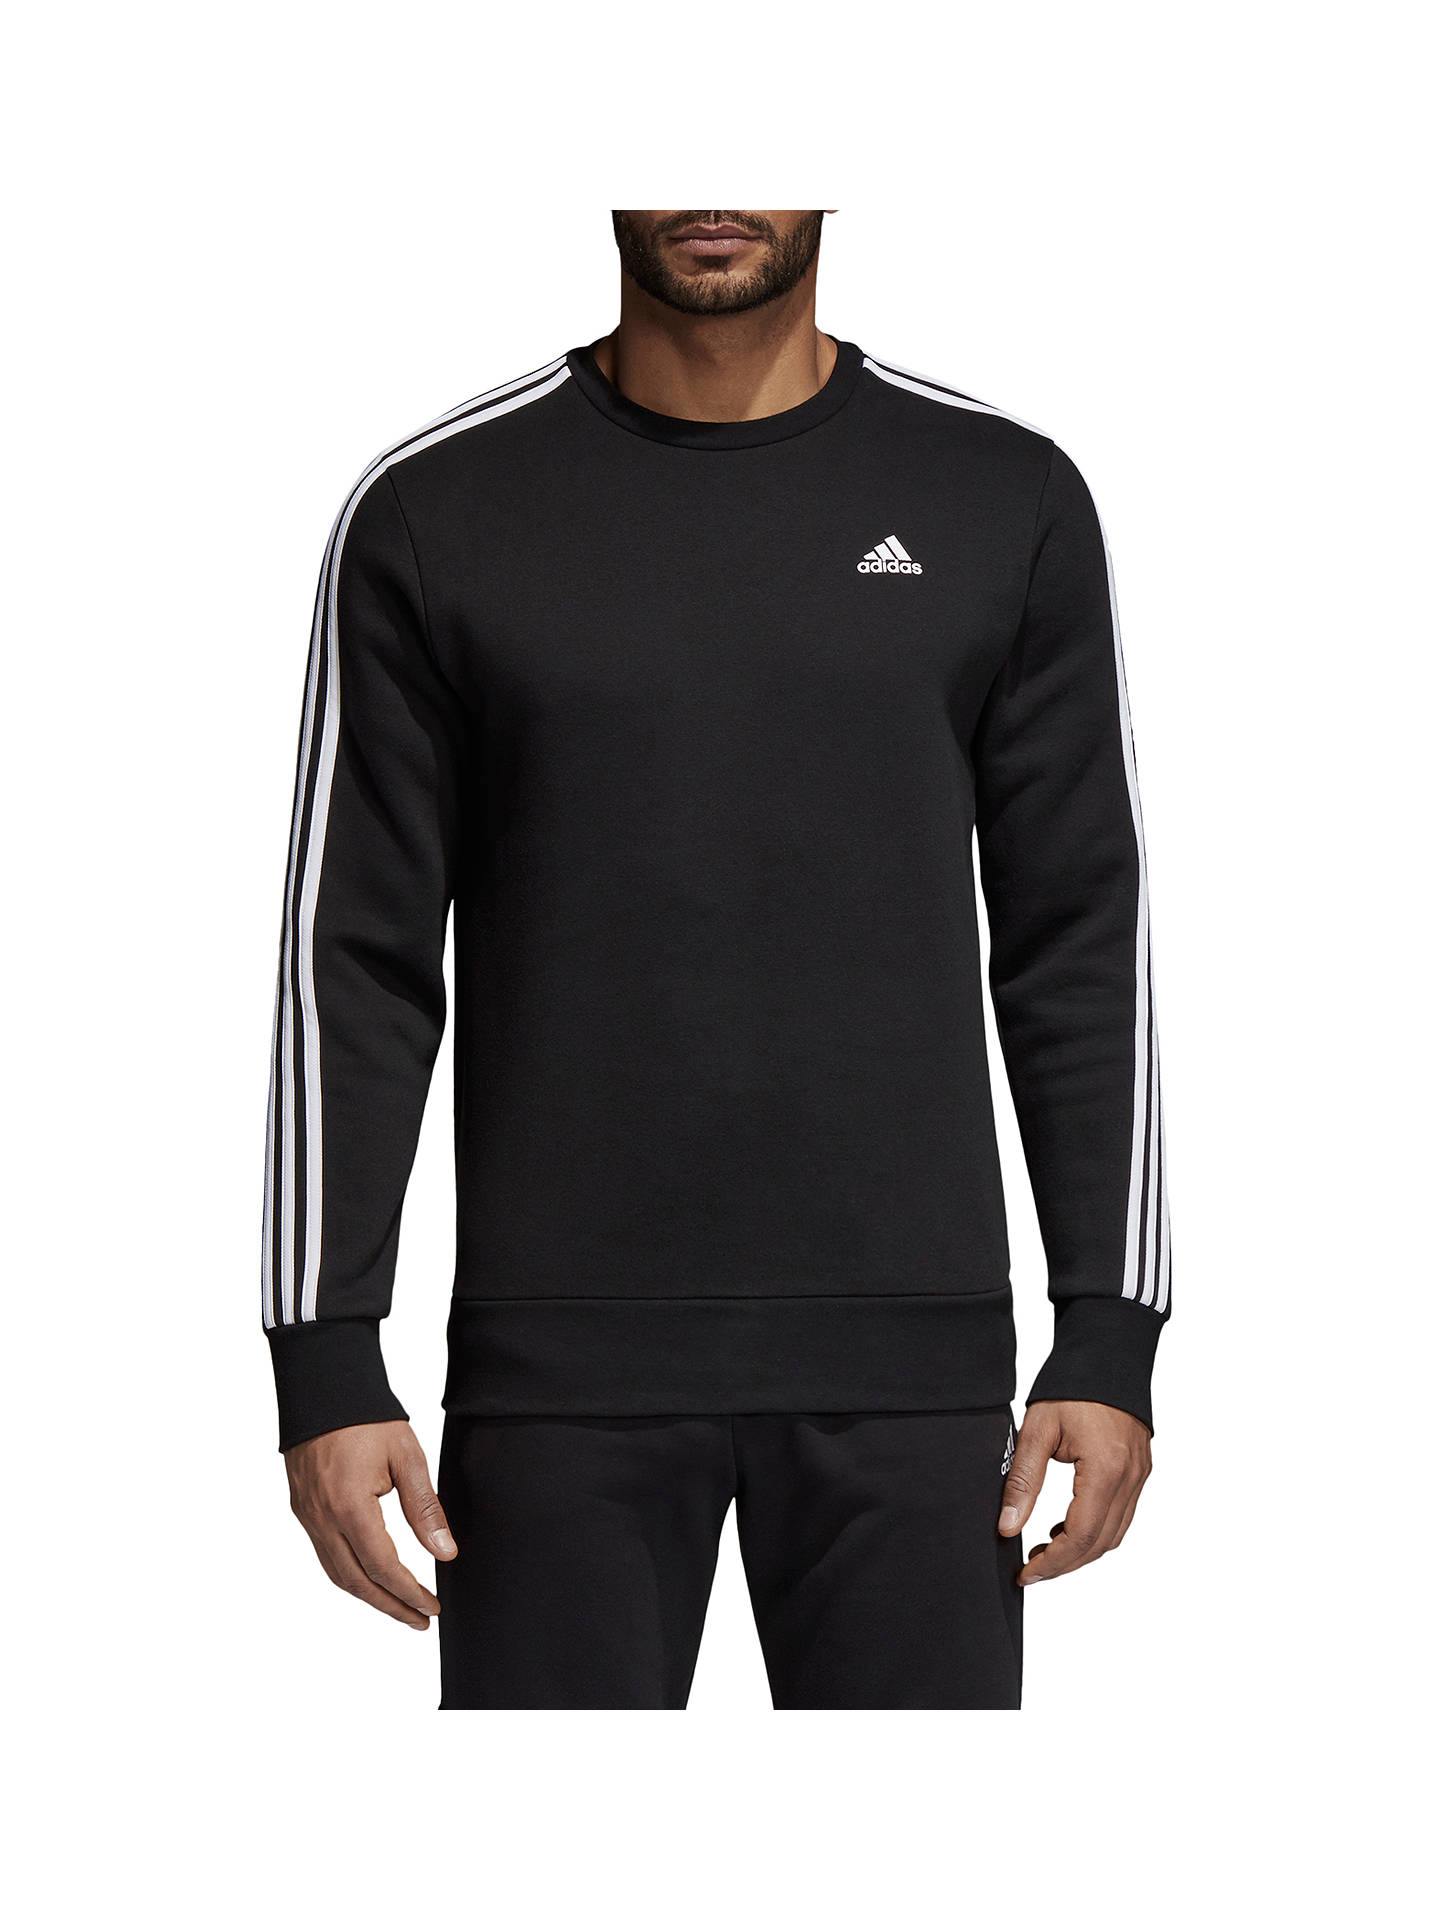 comunidad salchicha Influyente  adidas Essentials 3-Stripes Crew Sweatshirt at John Lewis & Partners